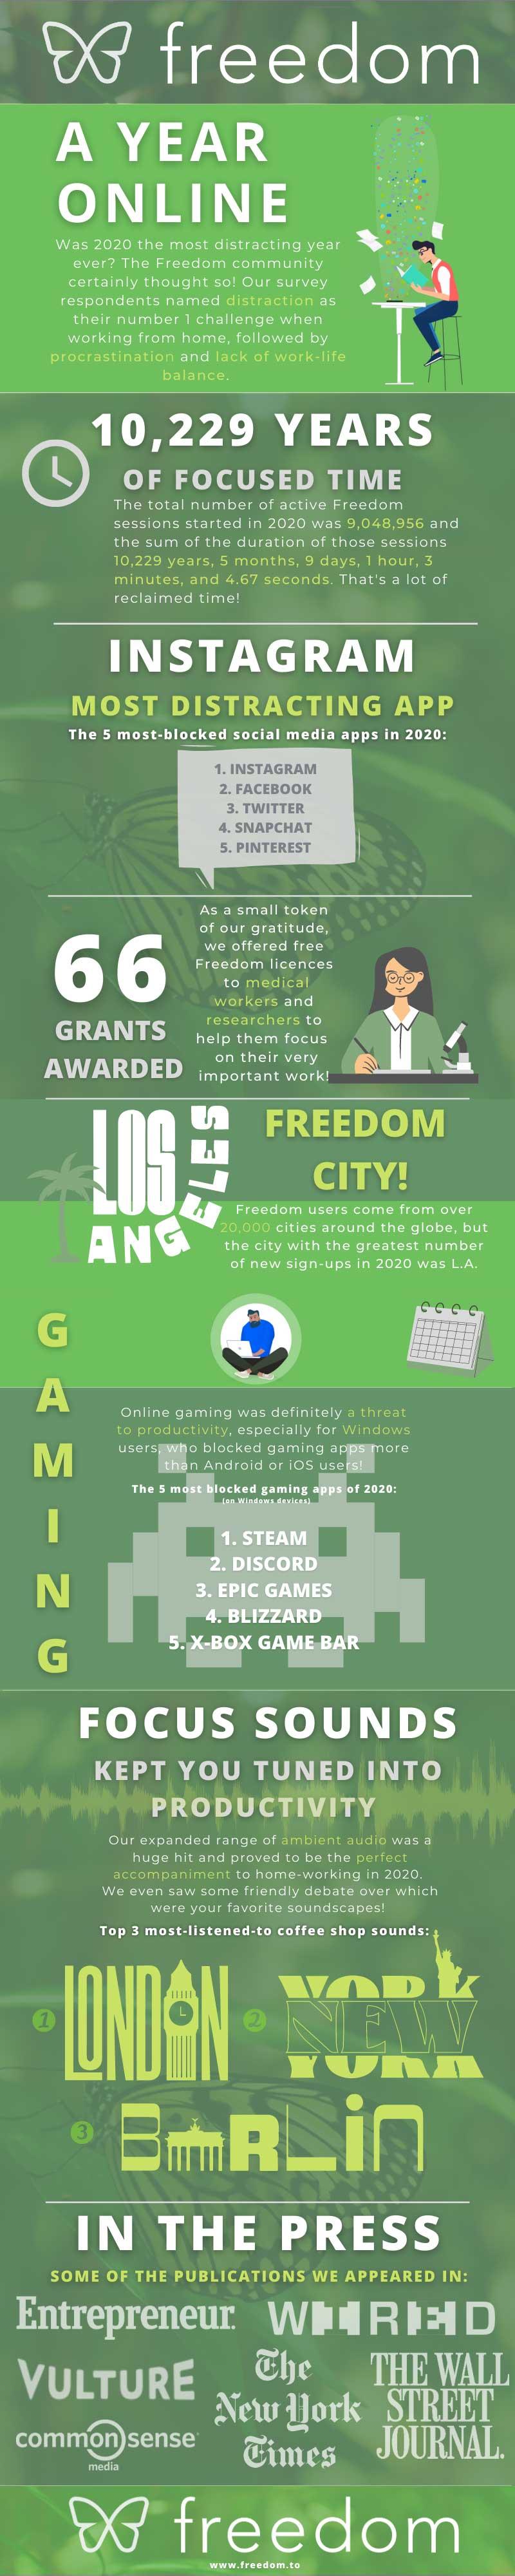 freedom 2020 a year online